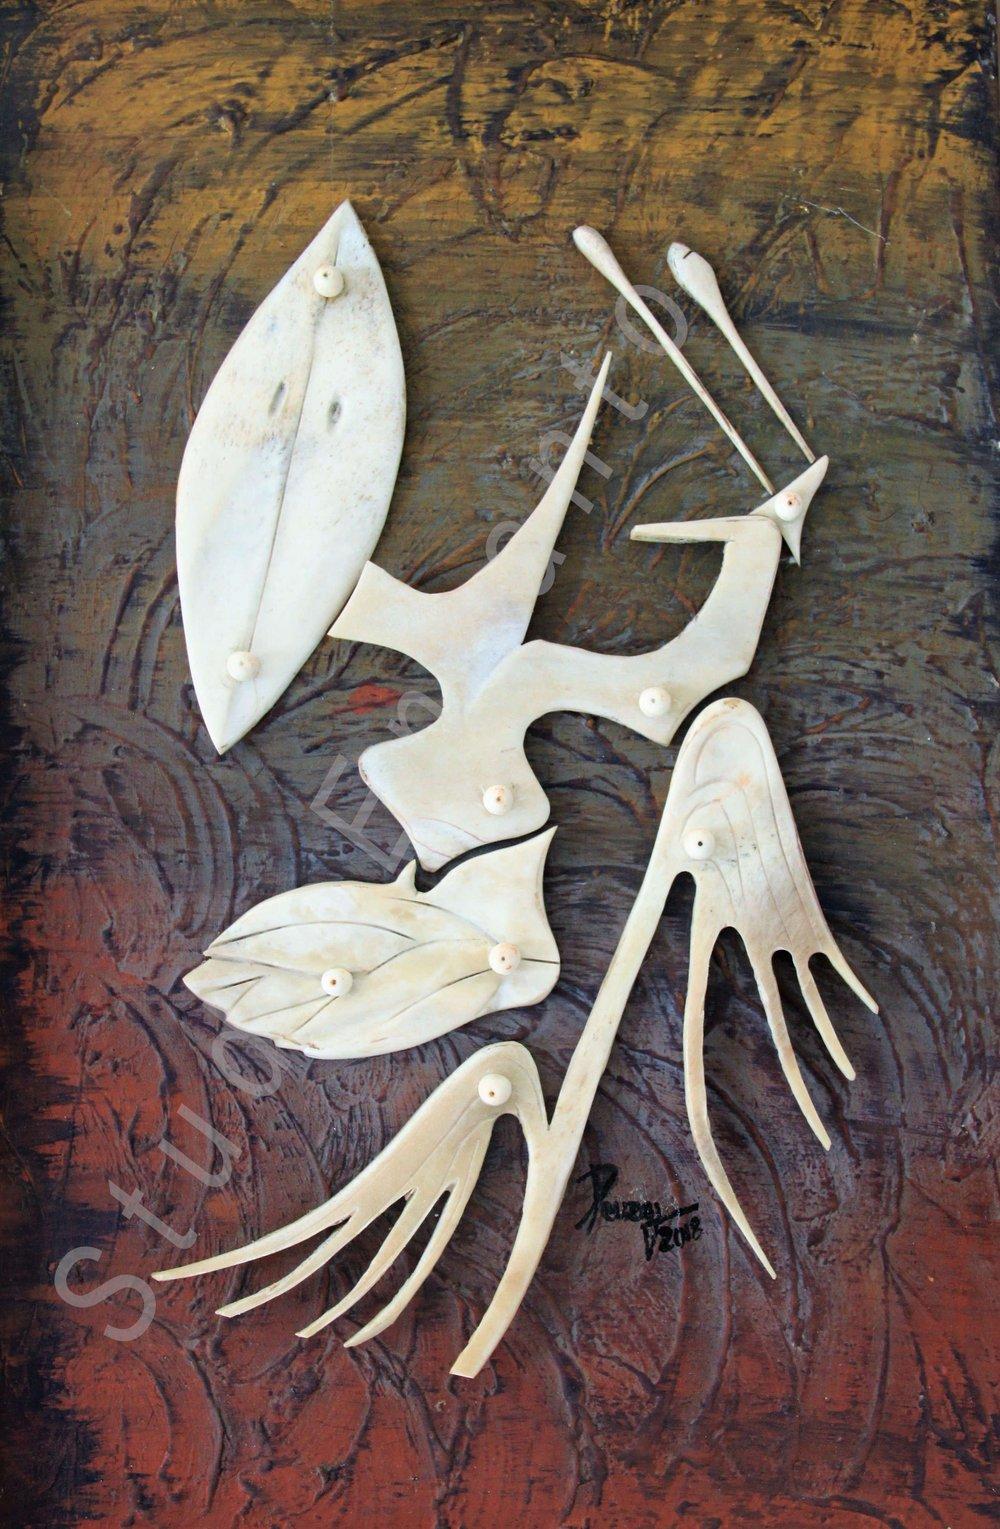 Image of Yaya - Aboriginal Deity Series by Rafael Cuza